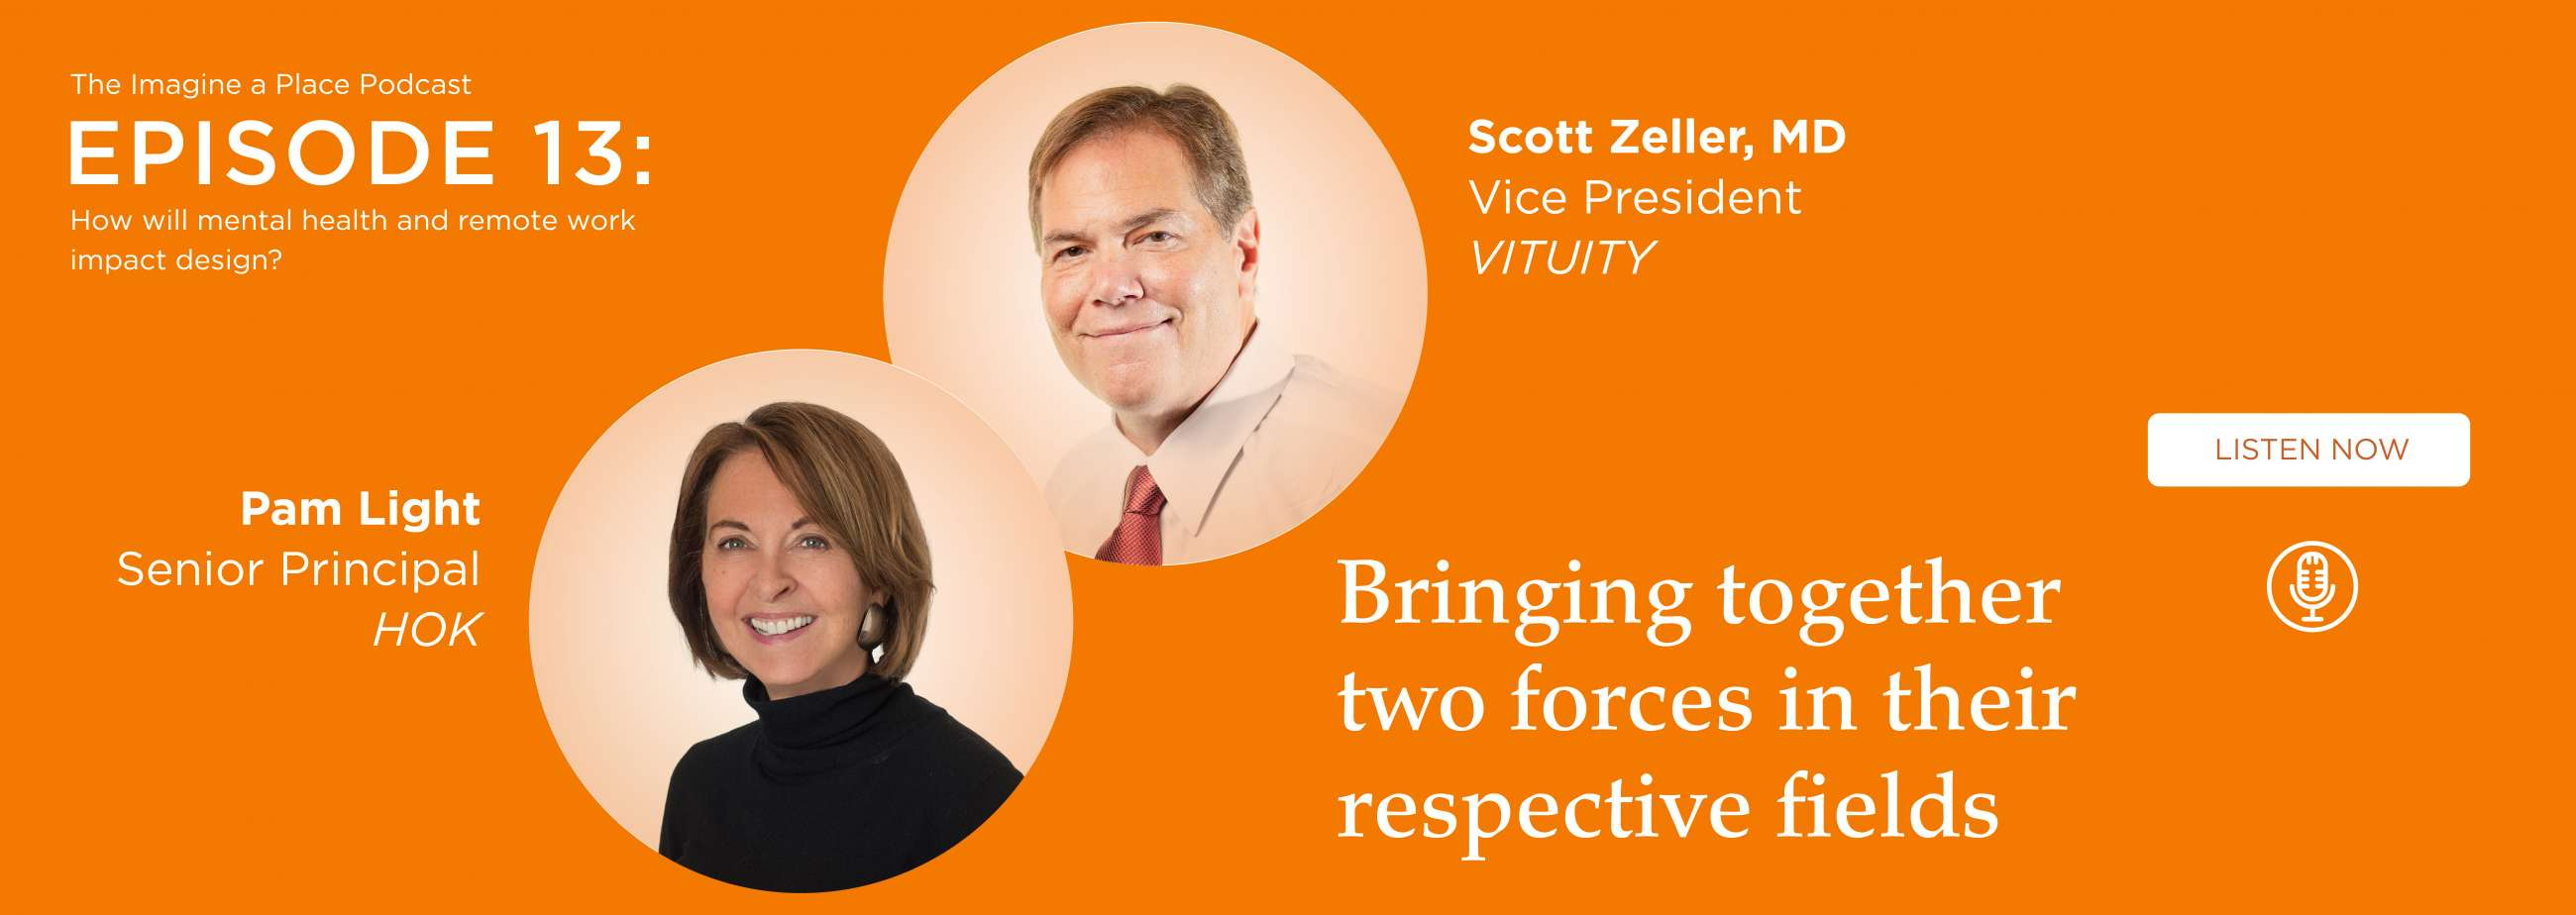 Pam Light (HOK) & Dr. Scott Zeller, MD (Vituity): How will mental health and remote work impact design? - Ep. 13